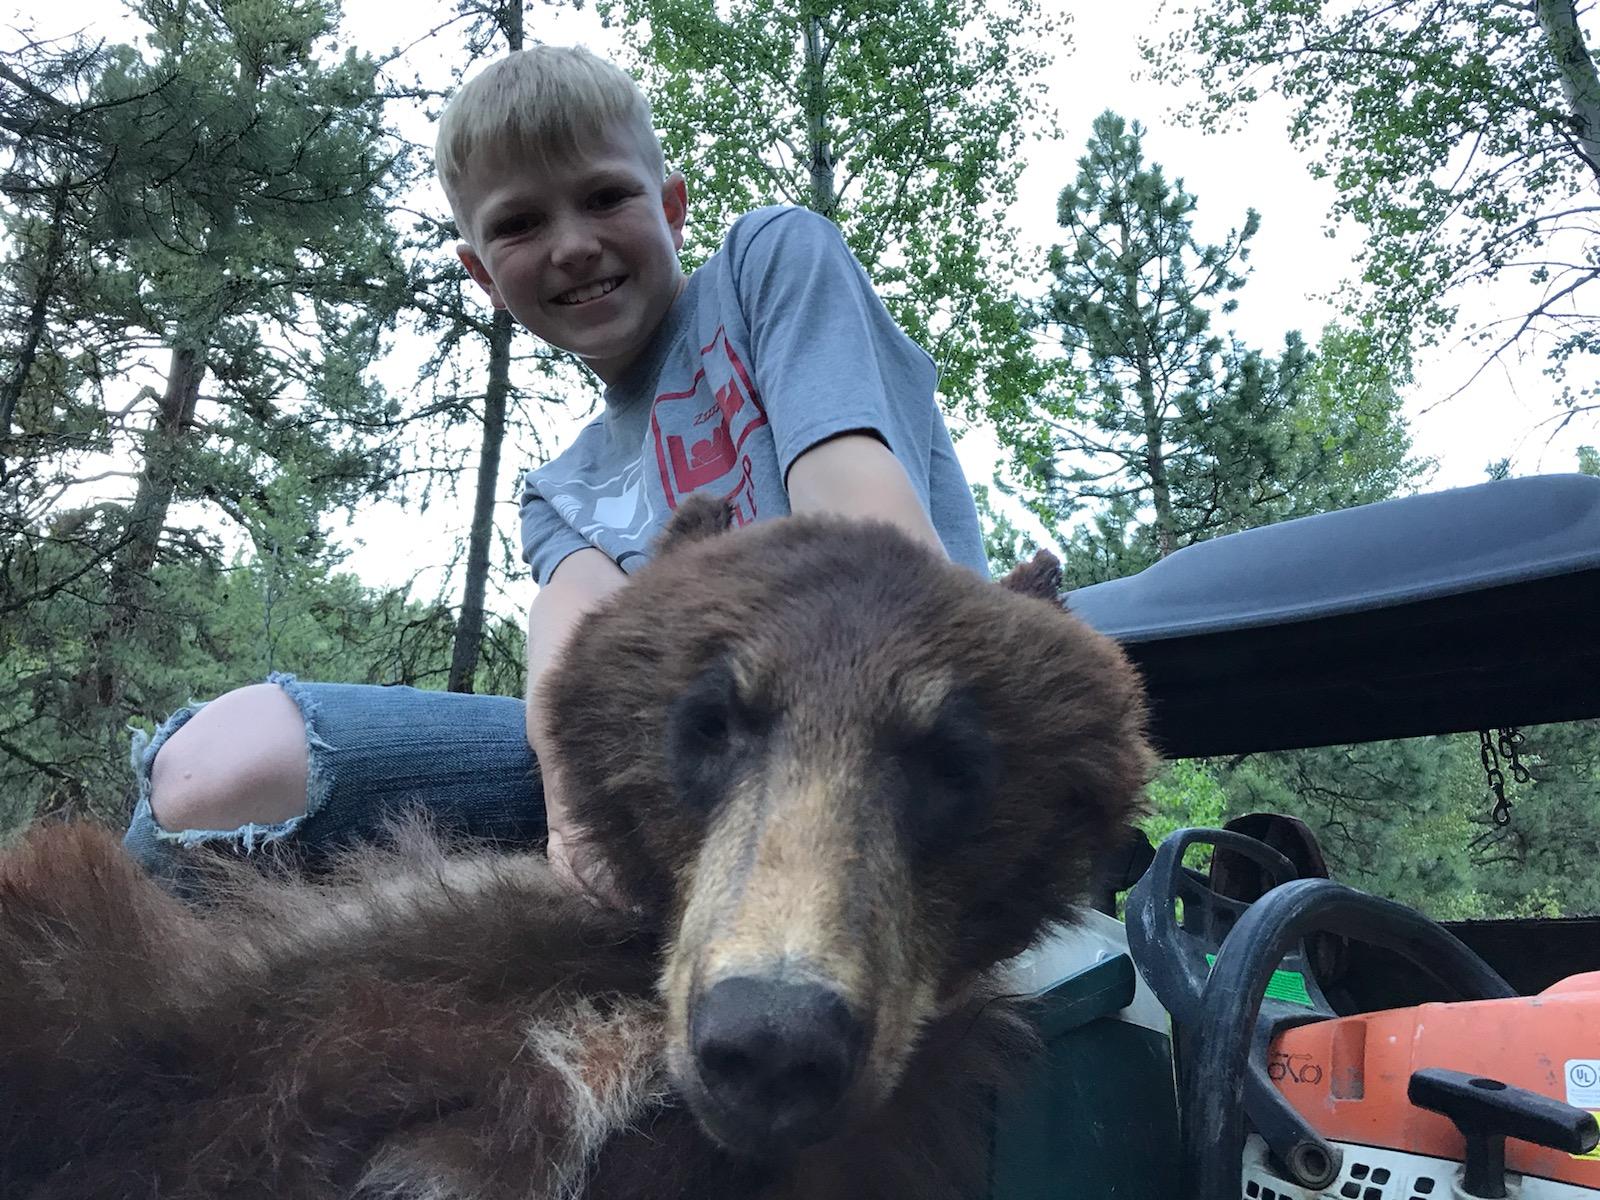 Young hunter harvests black bear